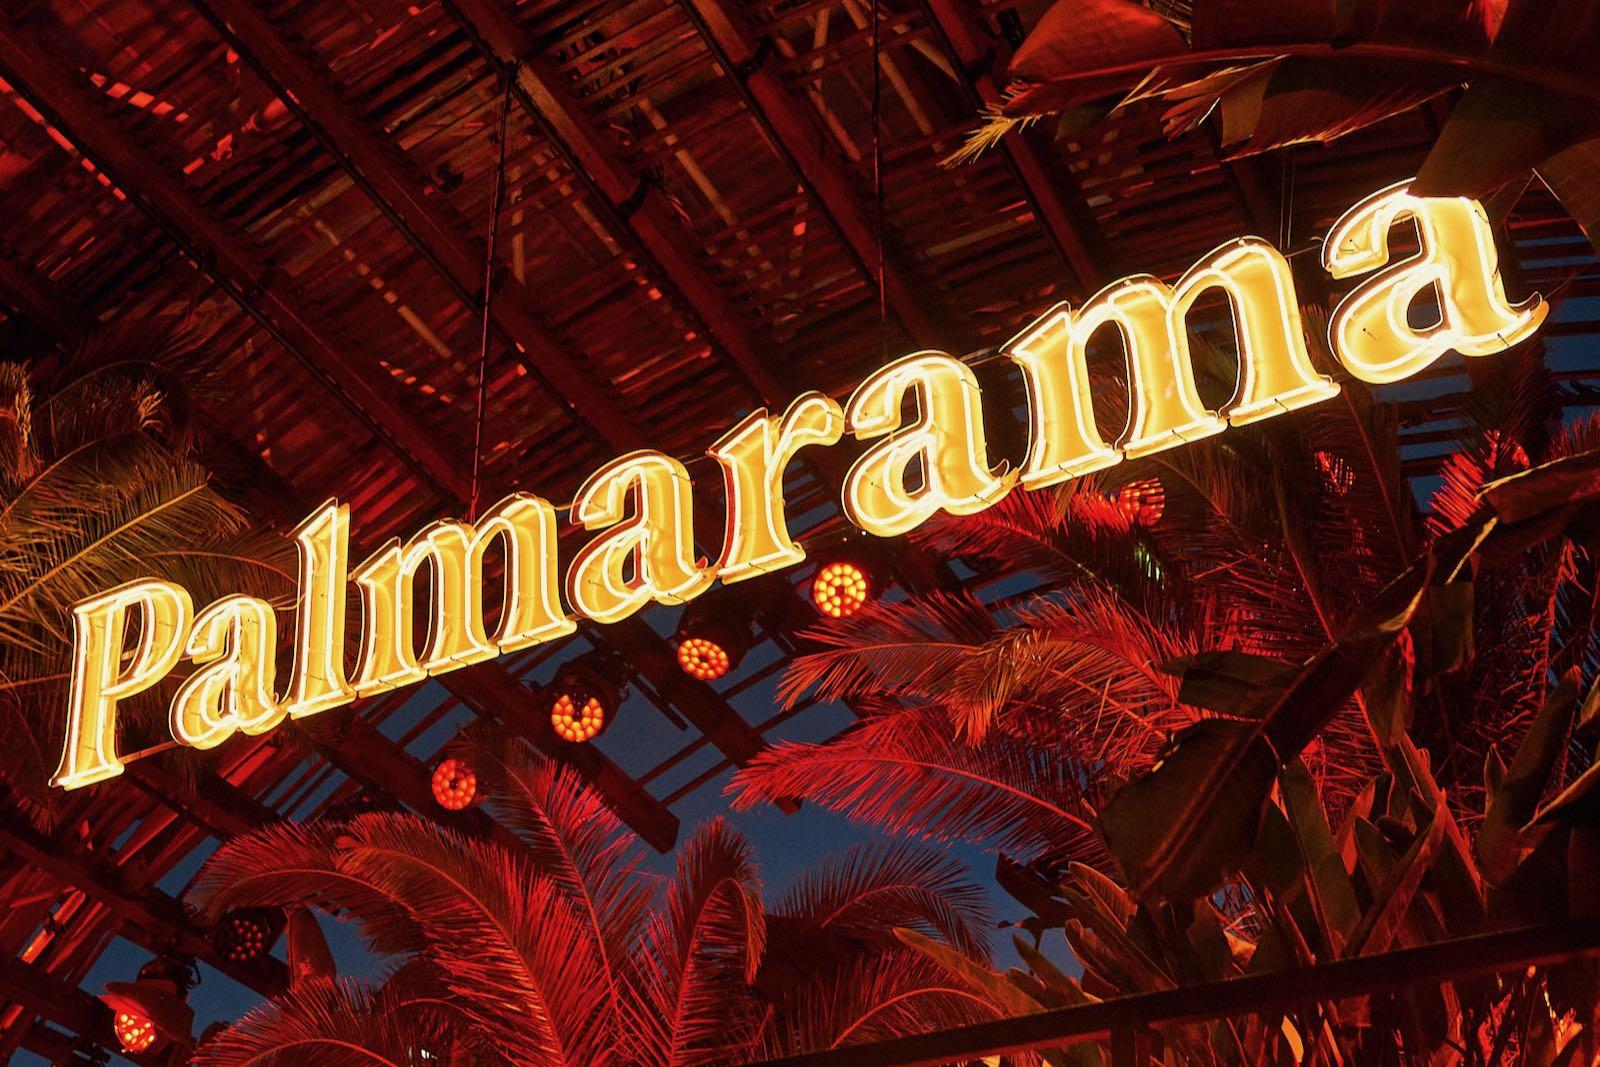 Palmarama at Ushuaïa Ibiza Beach Hotel